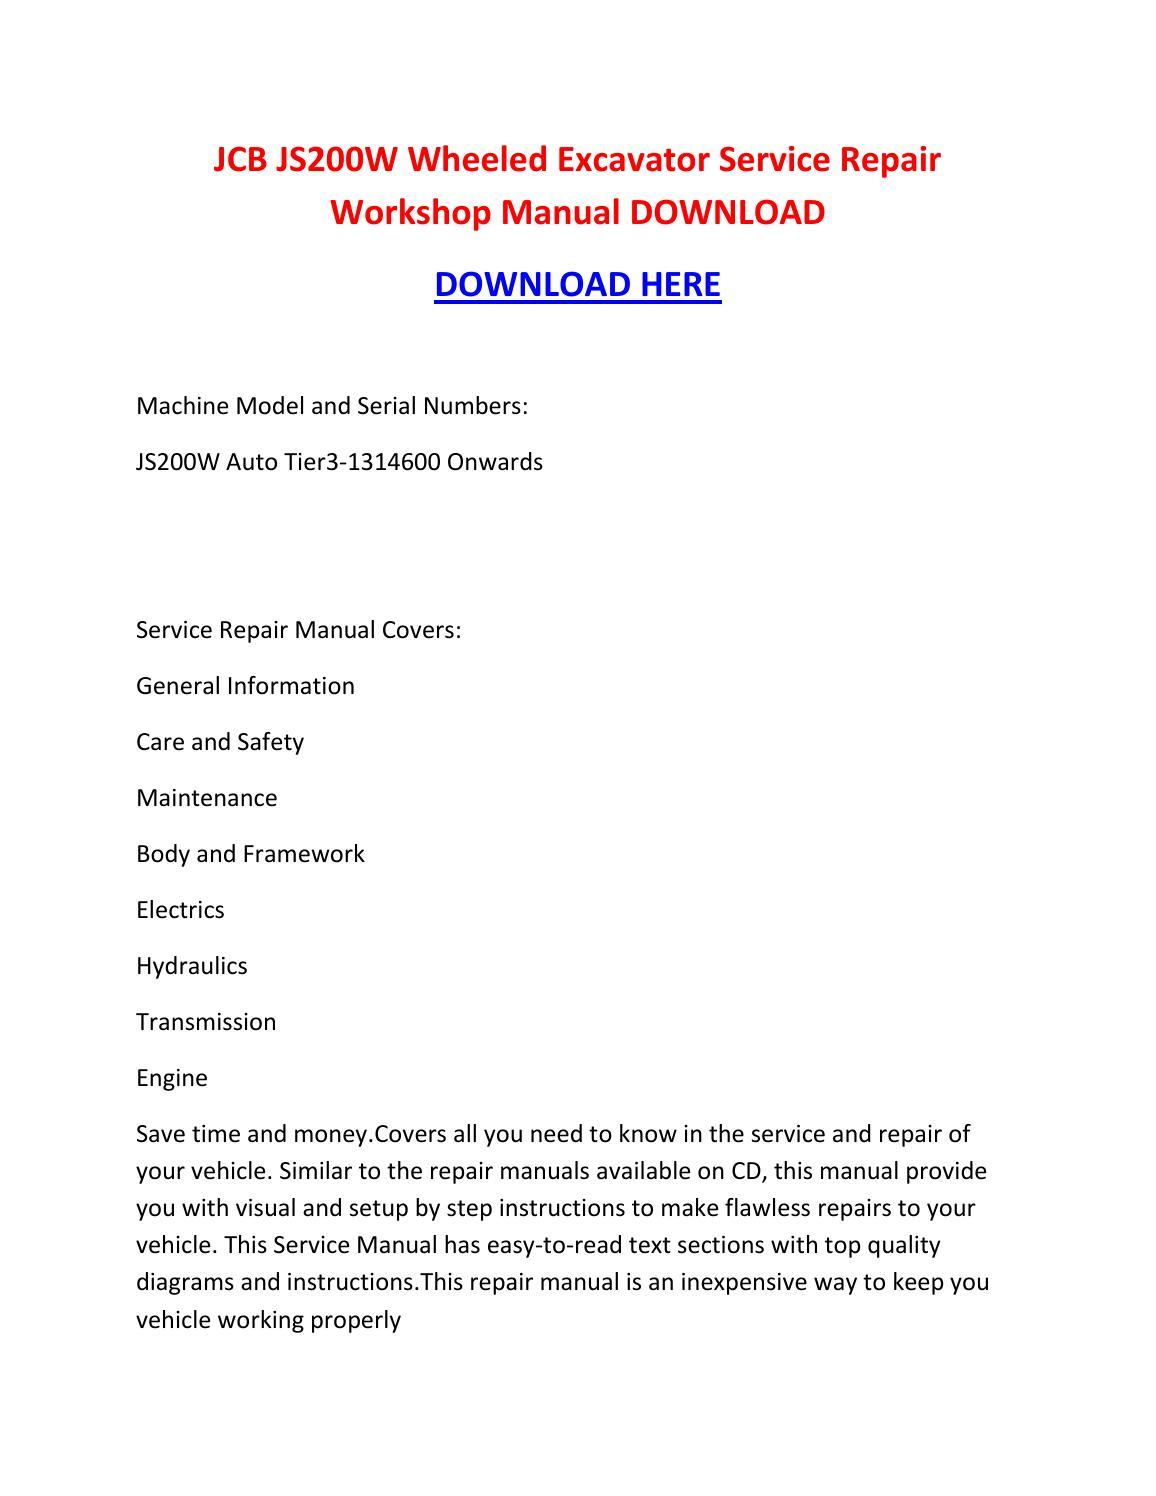 Jcb js200w wheeled excavator service repair workshop manual download by  brown jon - issuu